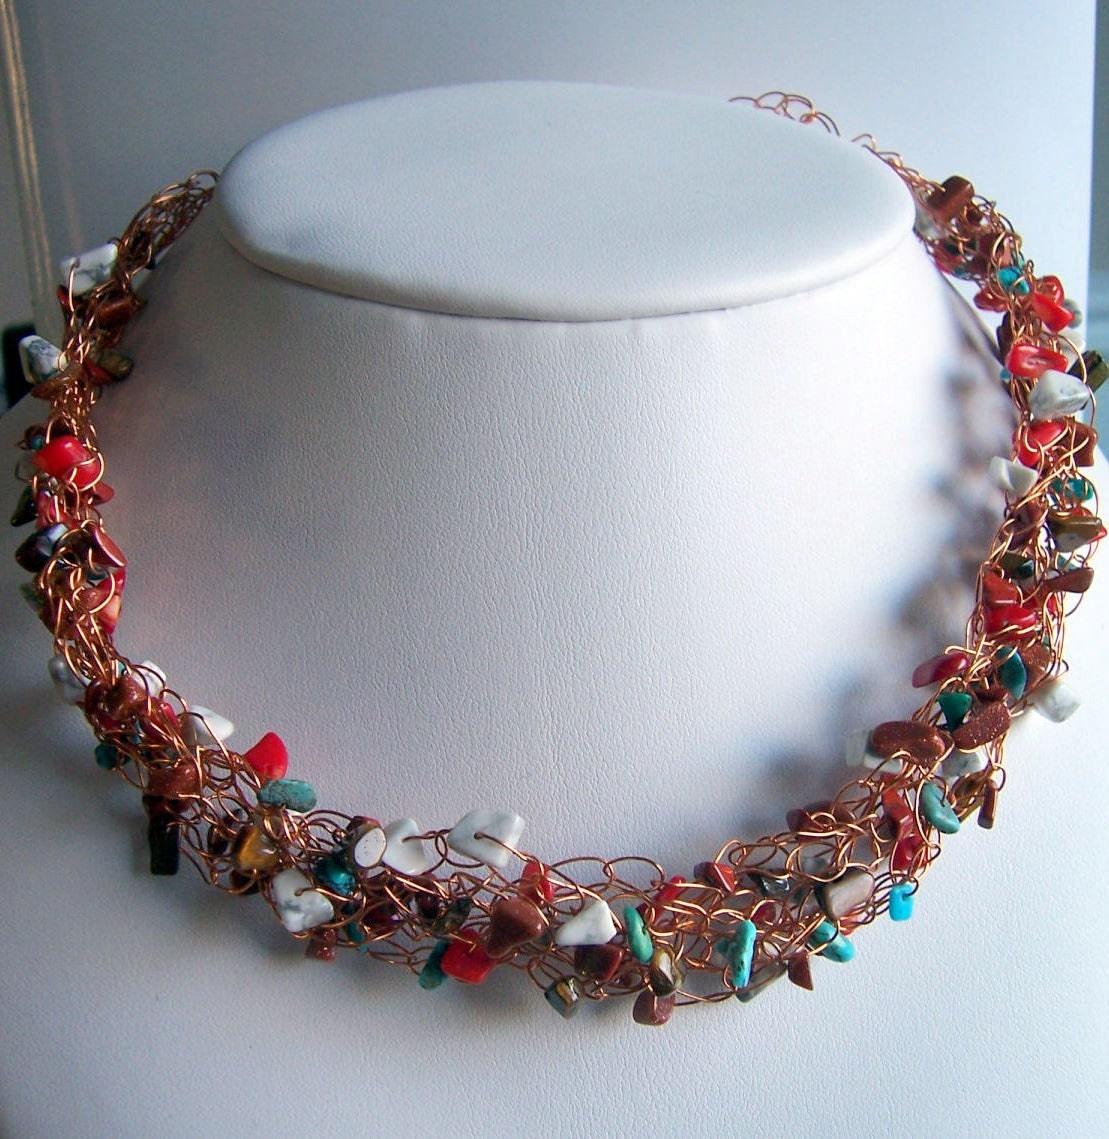 Choker Necklace Etsy: Wire Crochet Necklace Wire Crochet Jewelry By Starrydreams